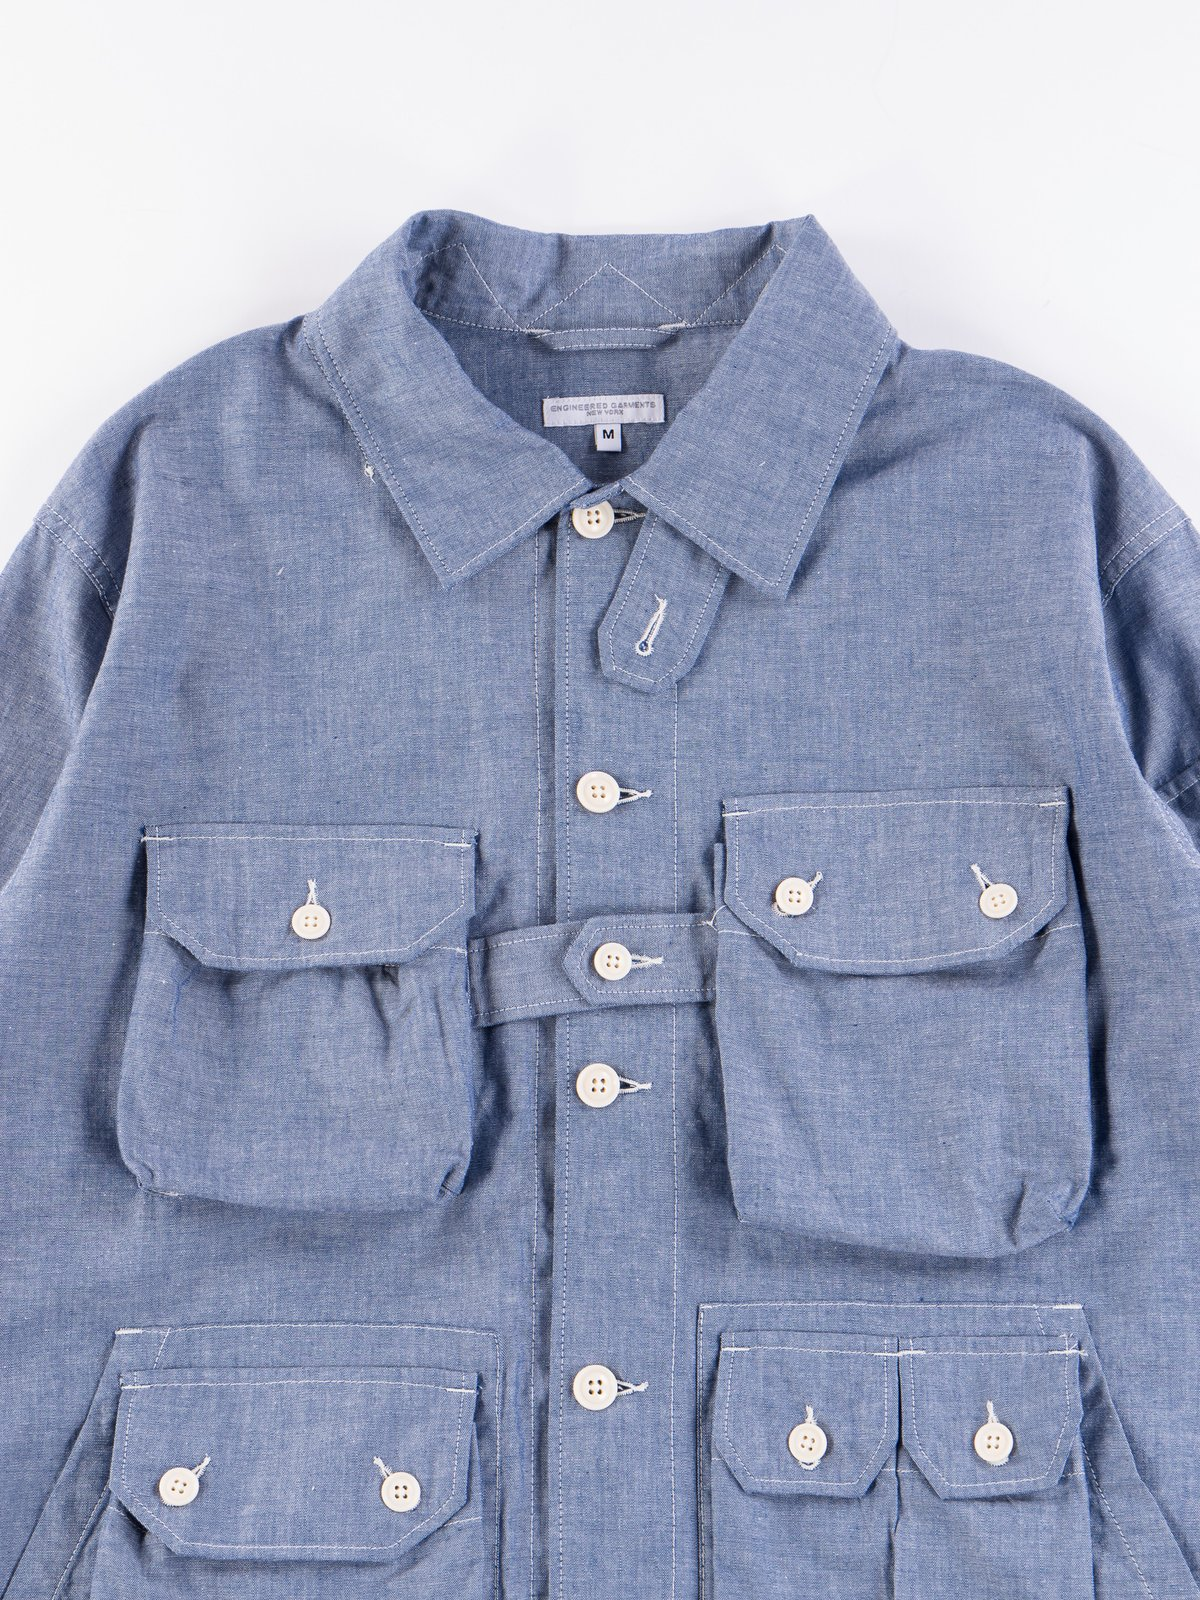 Blue Cotton Chambray Explorer Shirt Jacket - Image 4